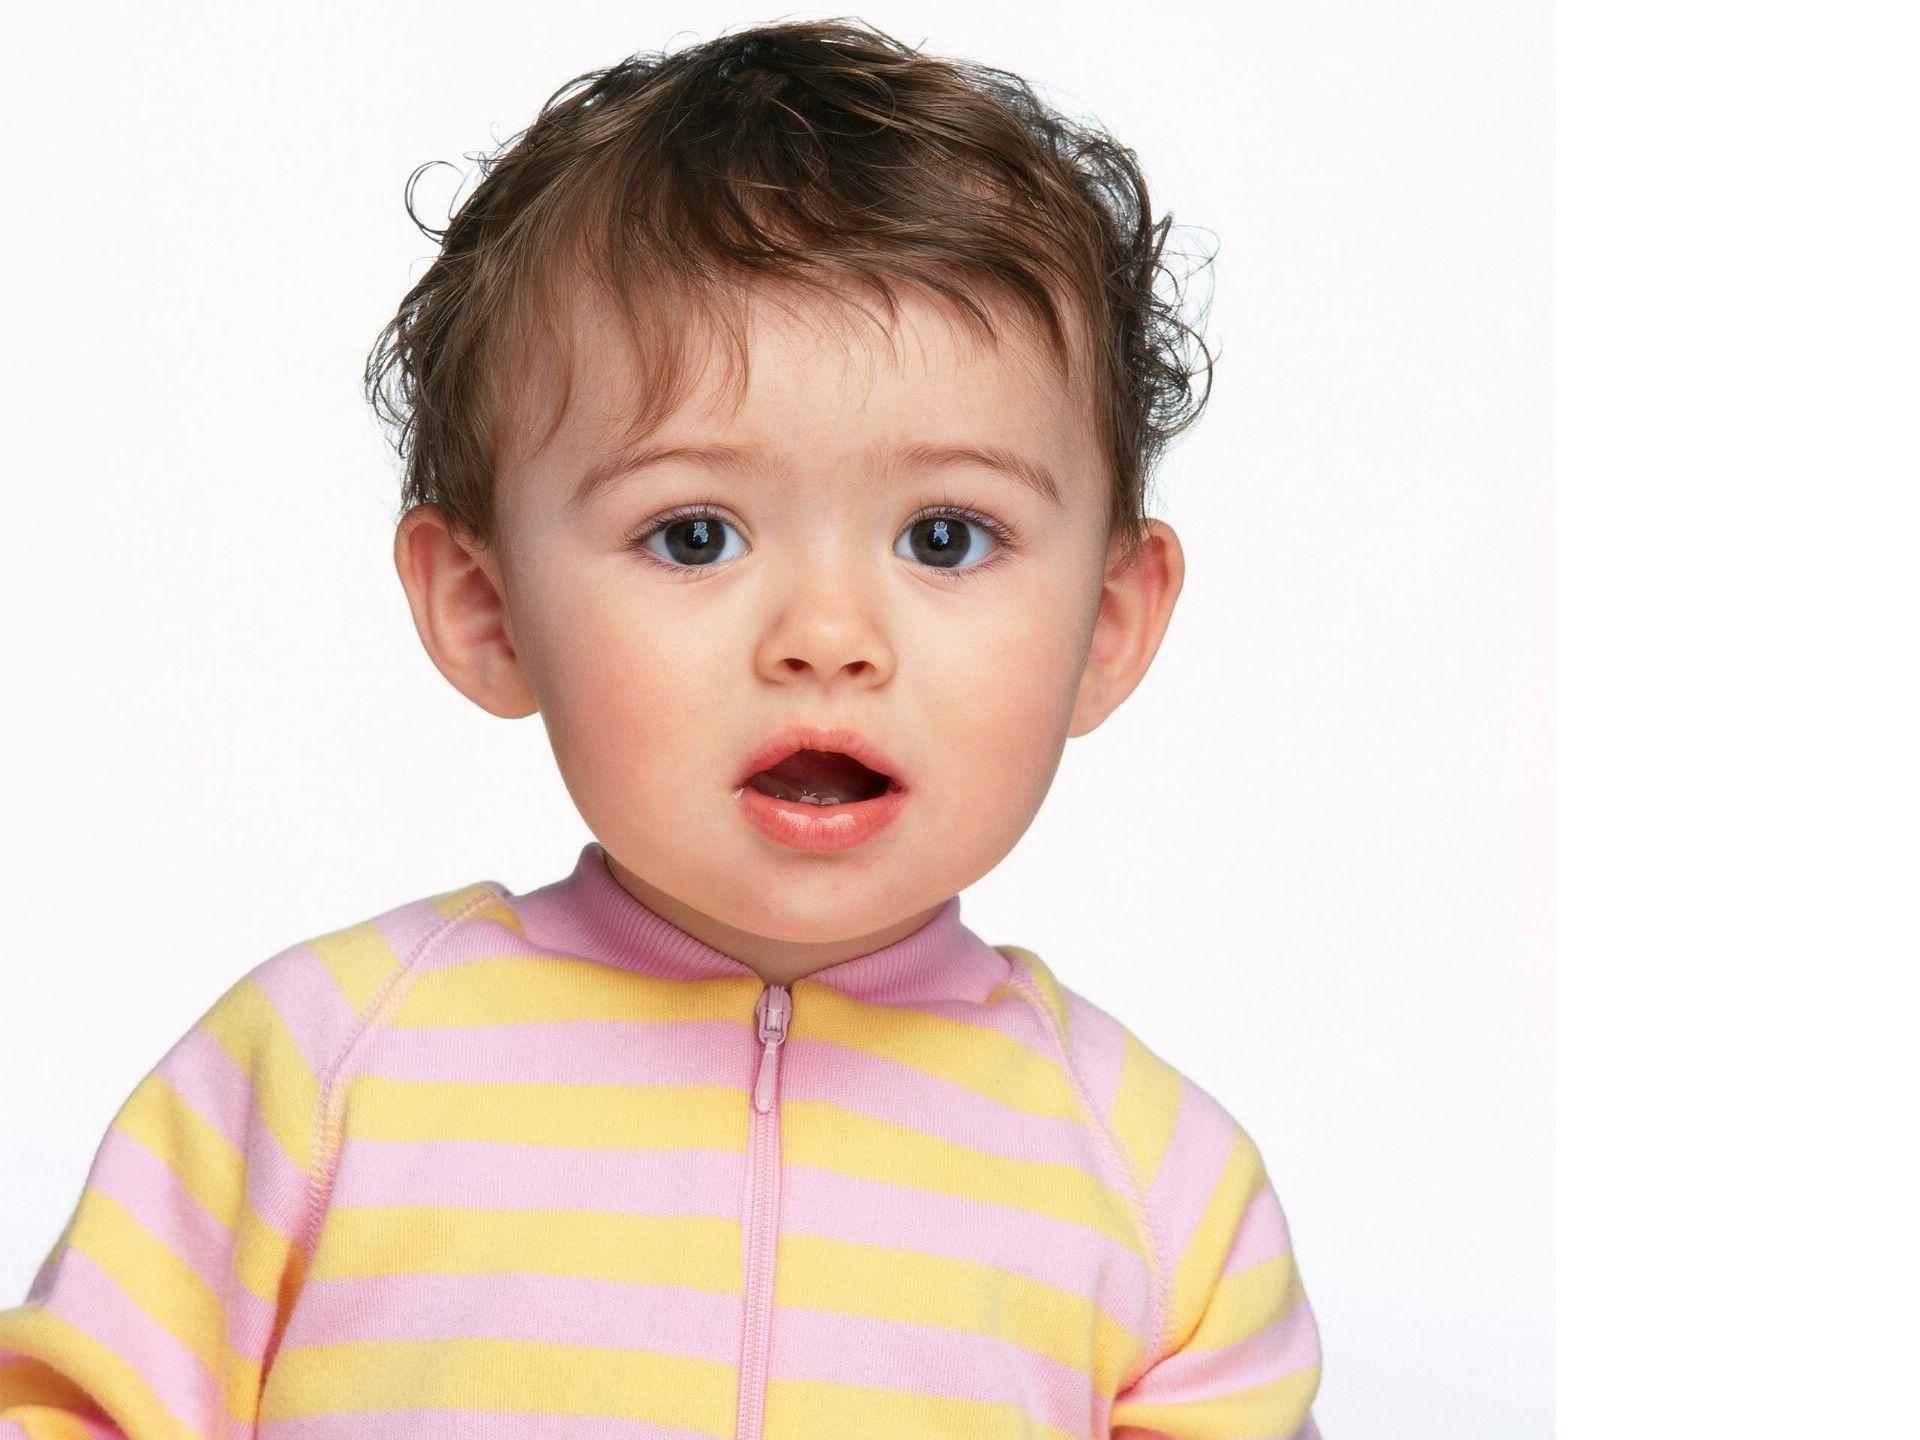 Grandchild Ren Cute Baby Wallpaper Cute Baby Boy Images Baby Wallpaper Hd